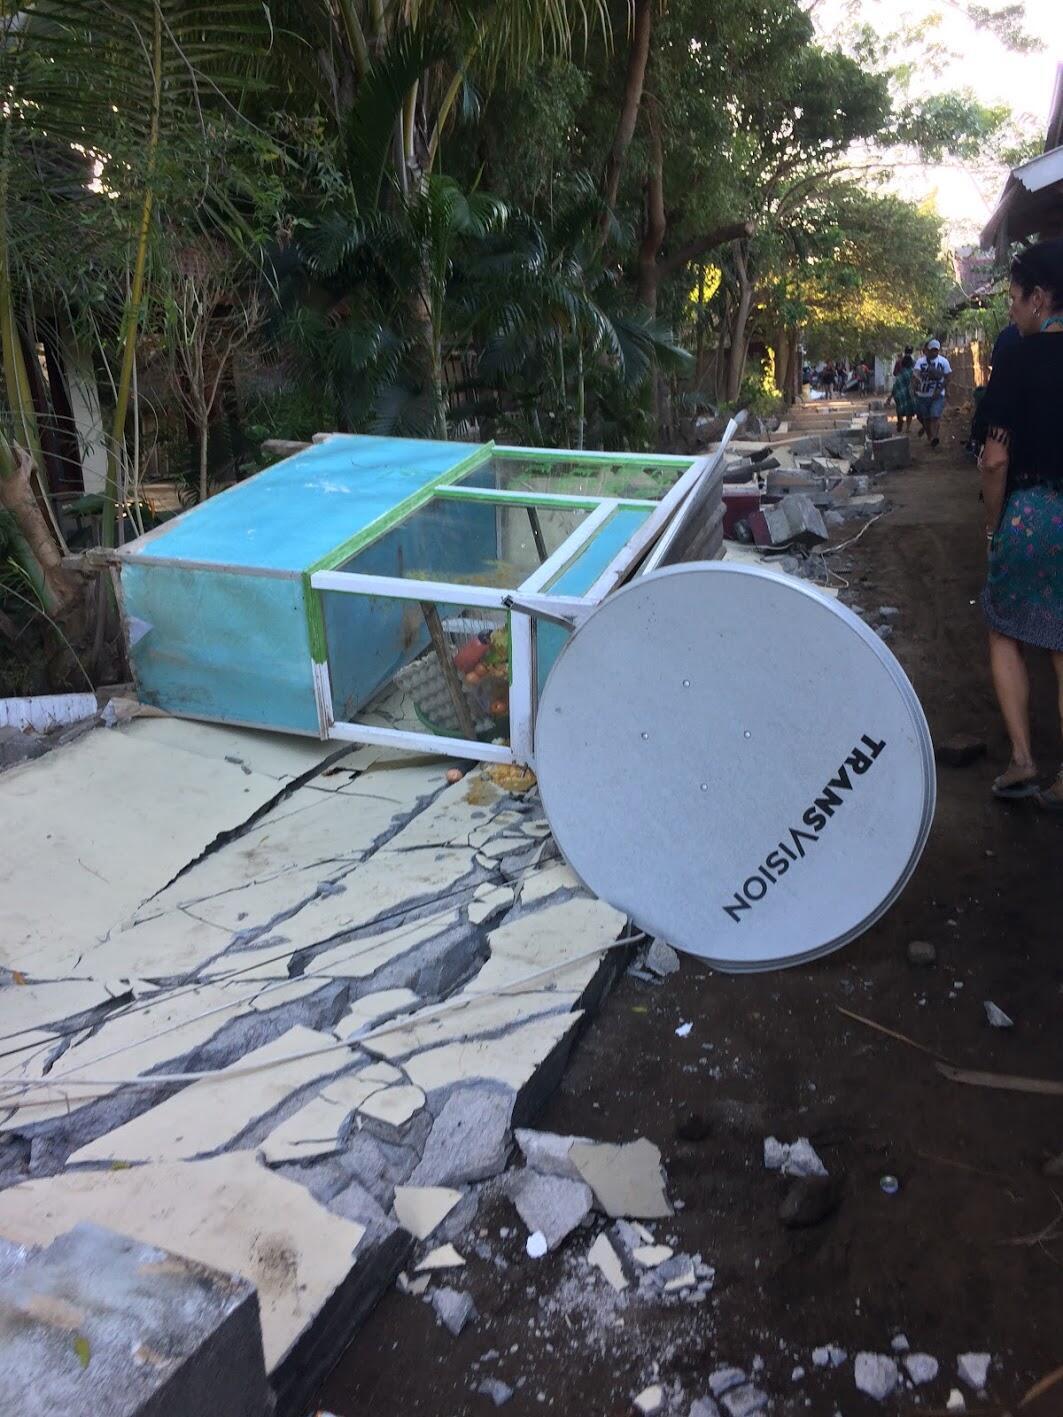 Aftermath of August 5th earthquake in Gili Trawangan, Lombok